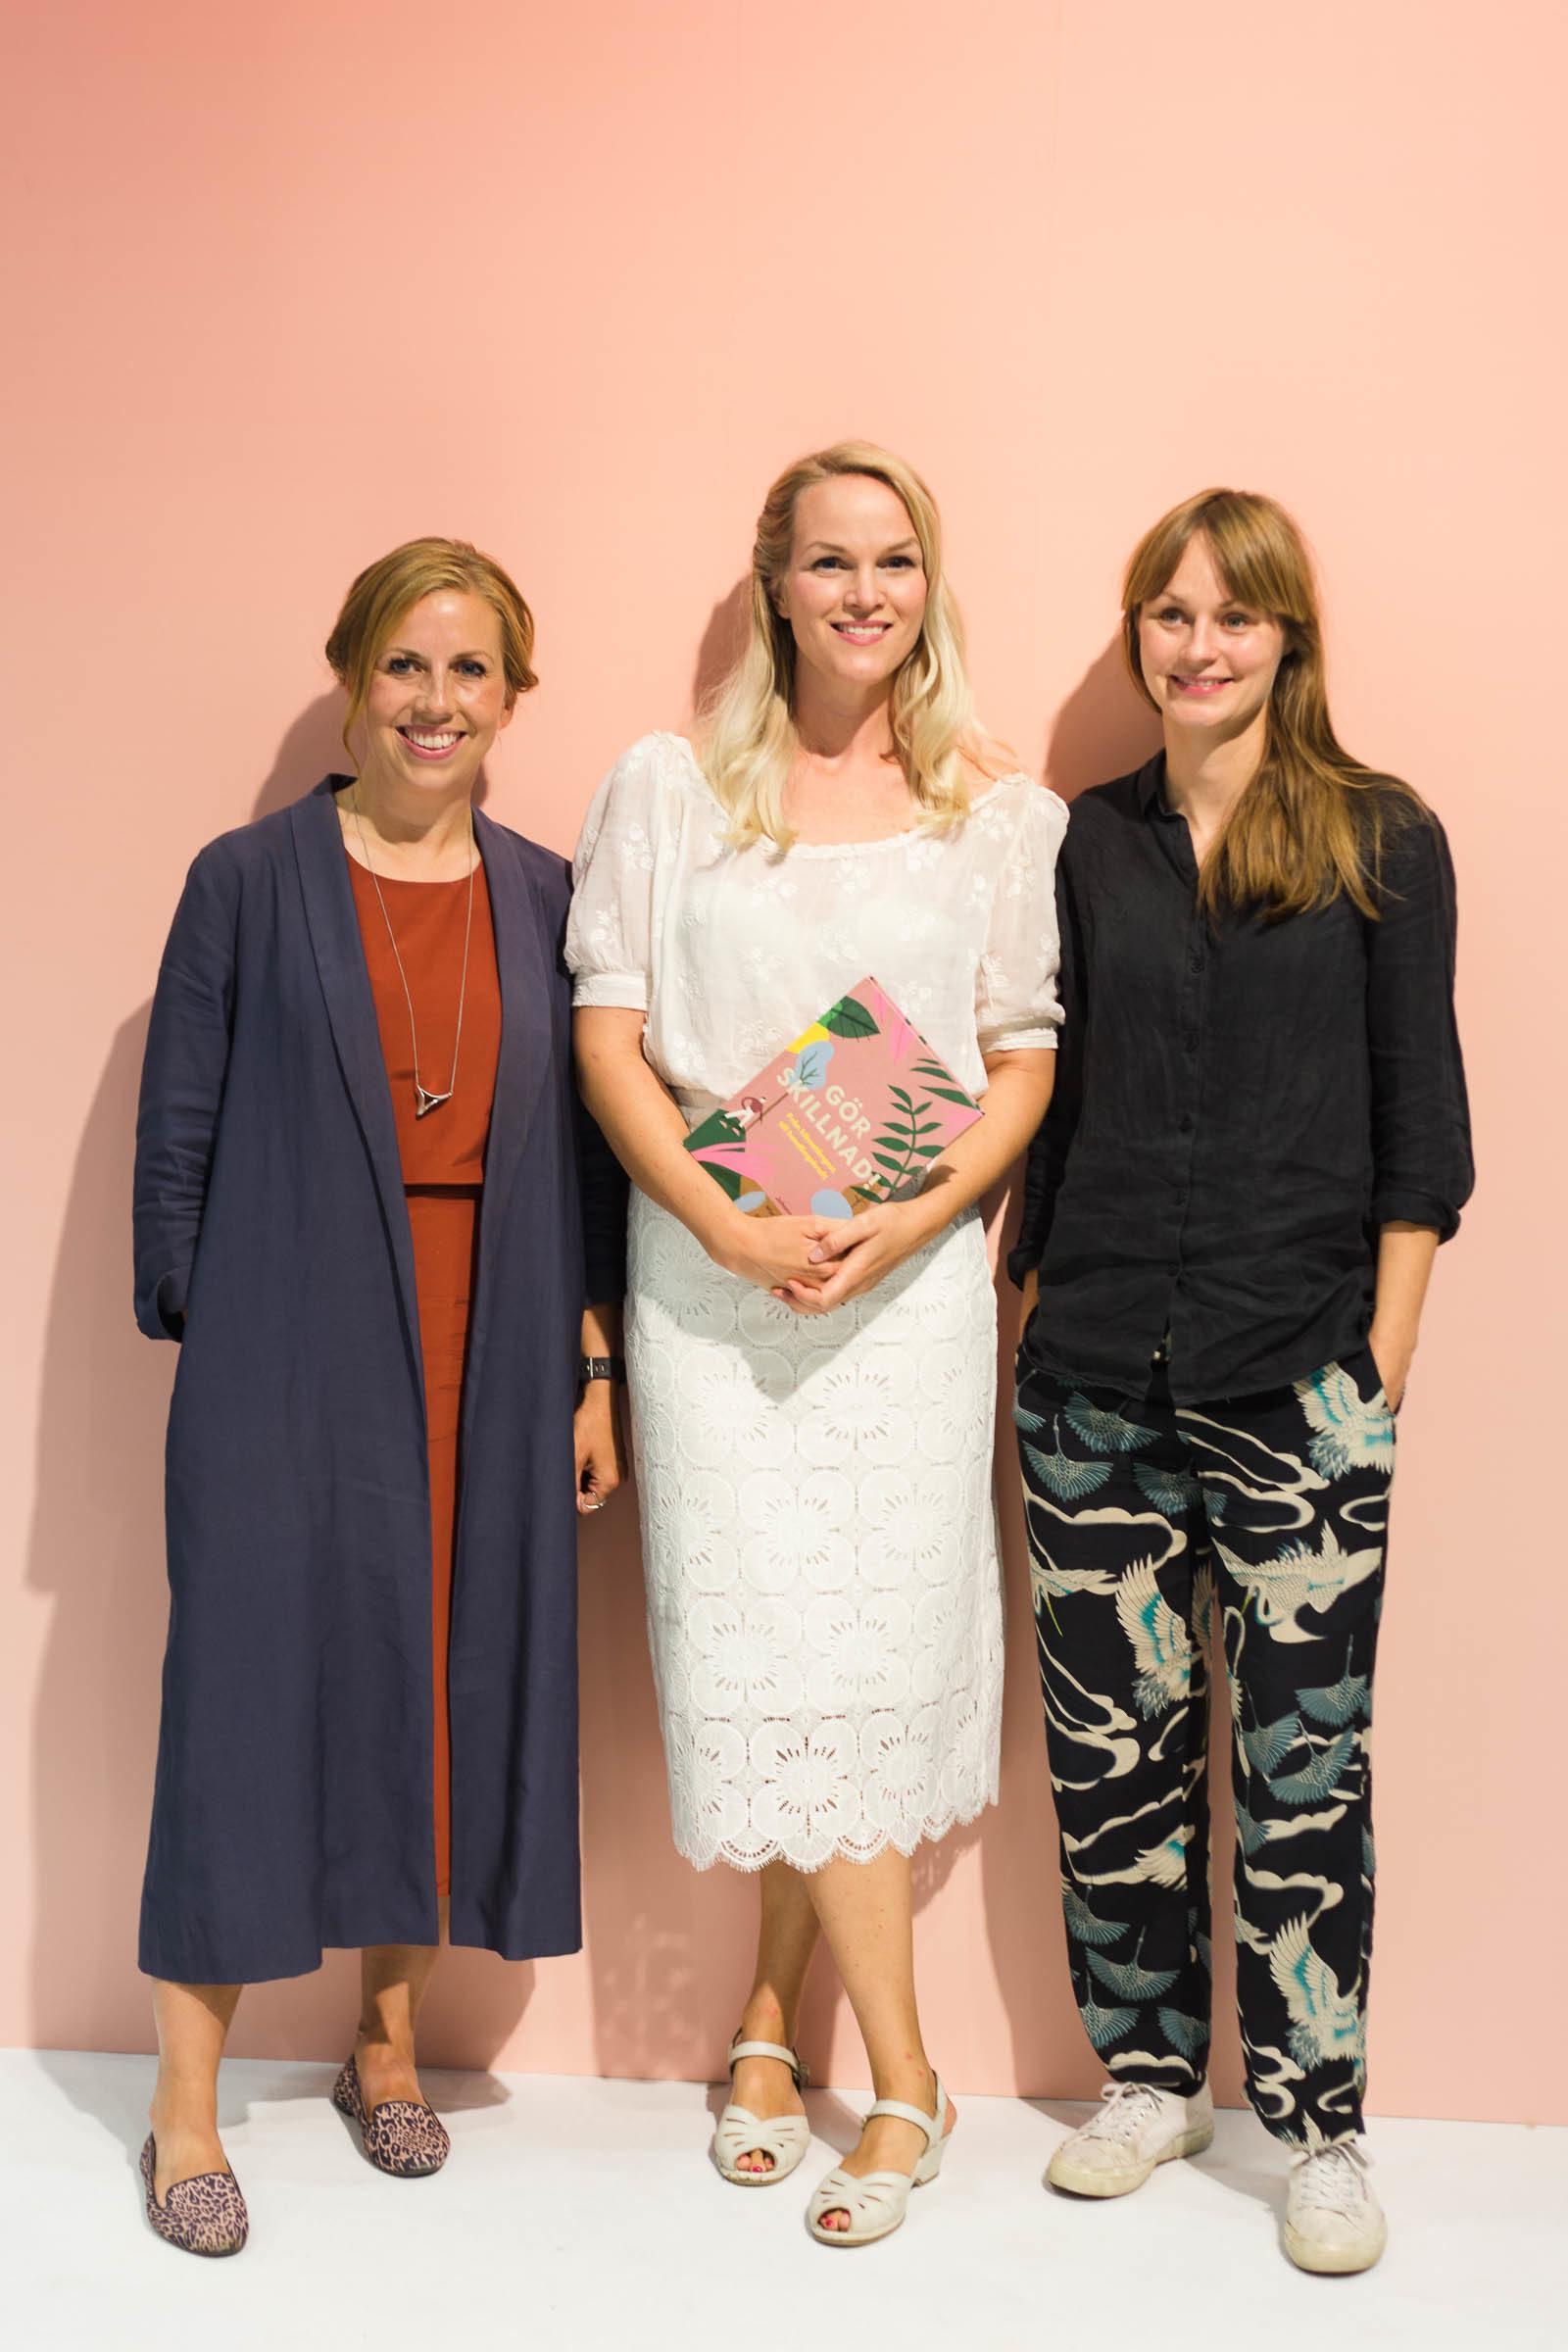 Maria Soxbo, Emma Sundh, Johanna Nilsson - Gör skillnad!